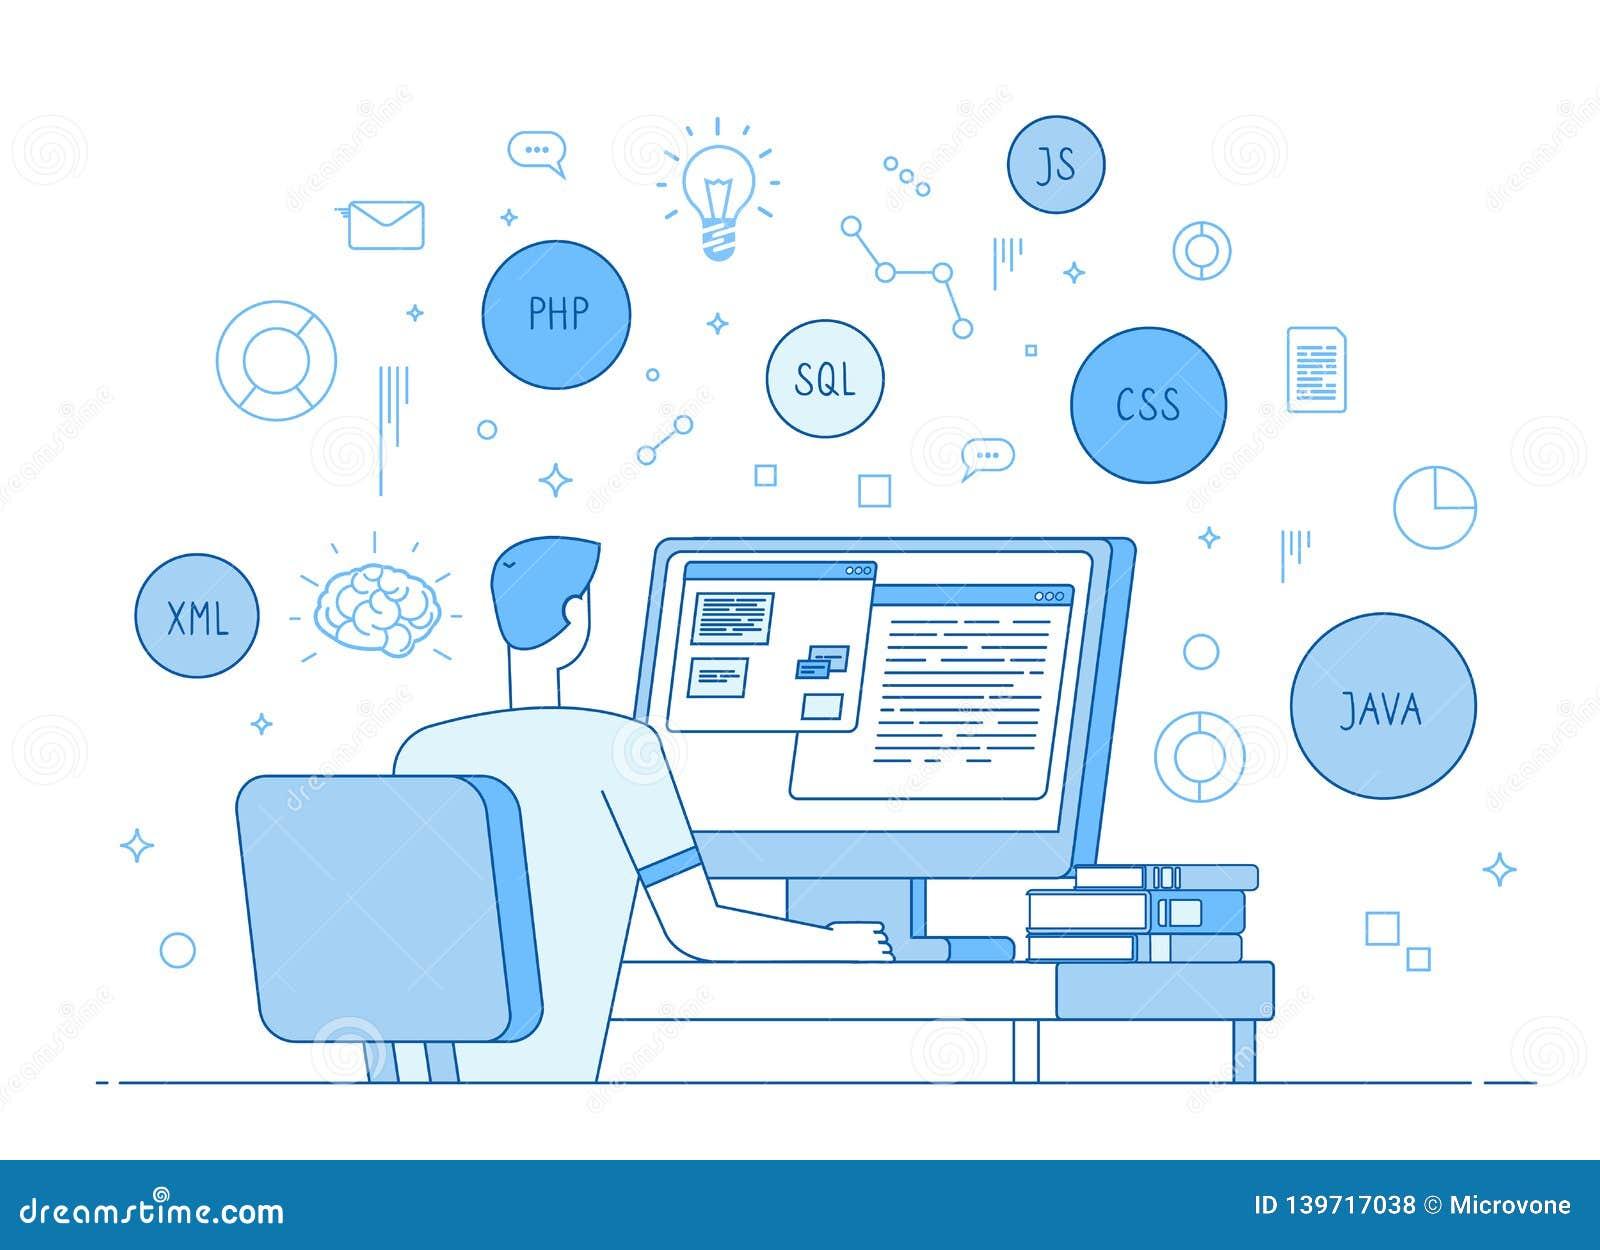 Programmer Coding Website Coder Web Designer Works On Javascript Php Code Programming Language Software Development Stock Vector Illustration Of Graphic Application 139717038